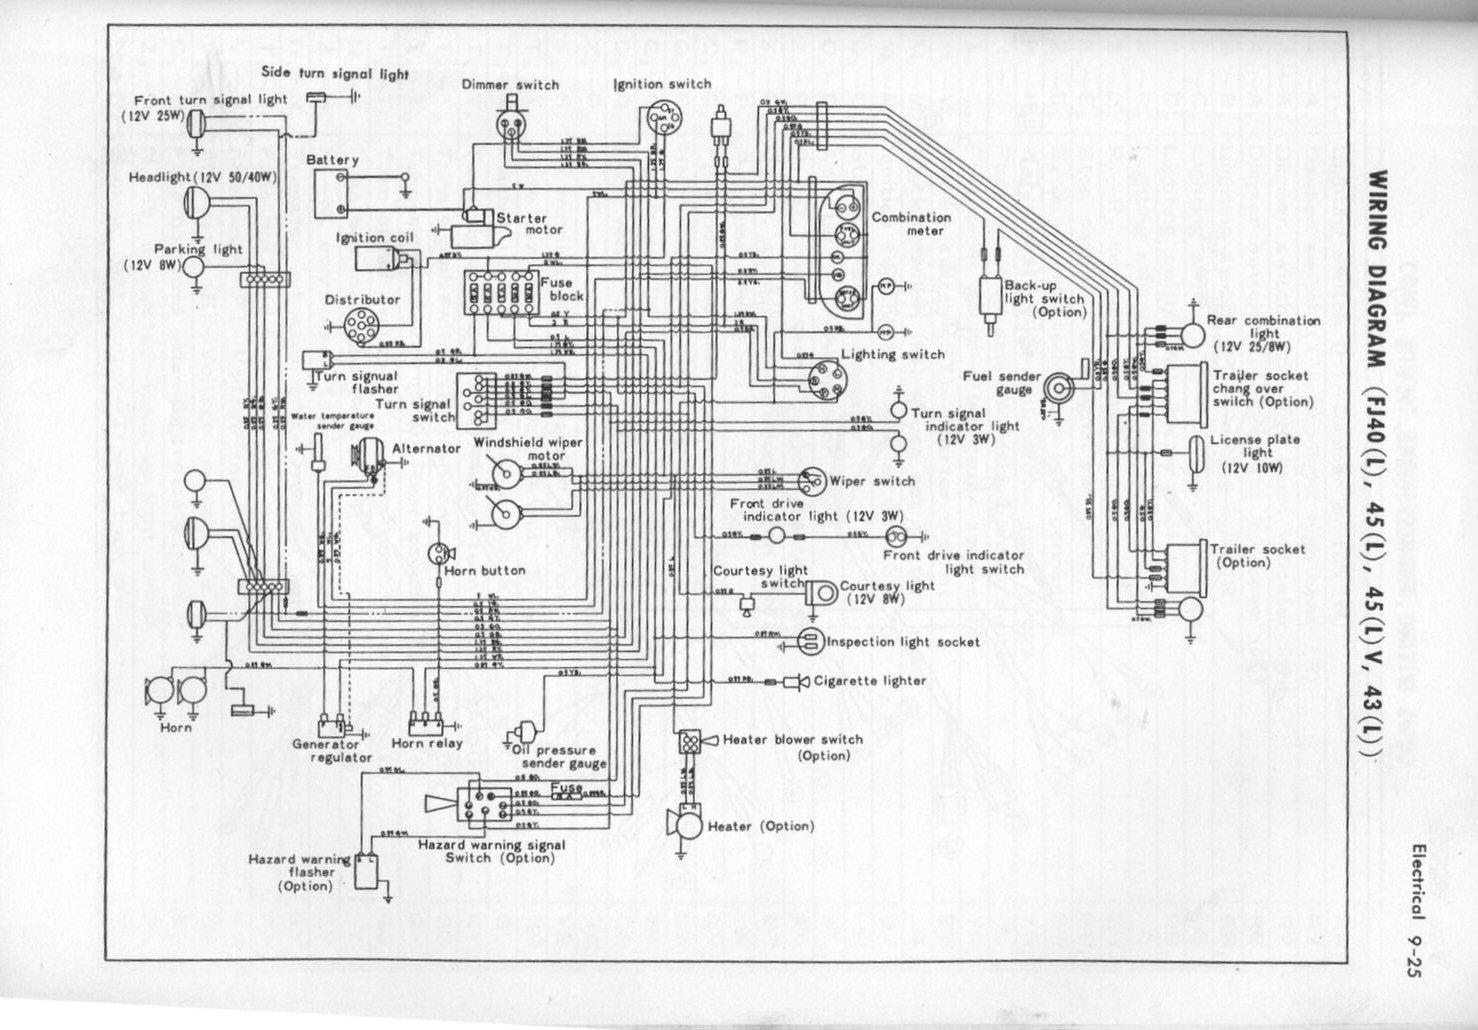 Diagram Toyota Scion Xb Xb Electrical Wiring